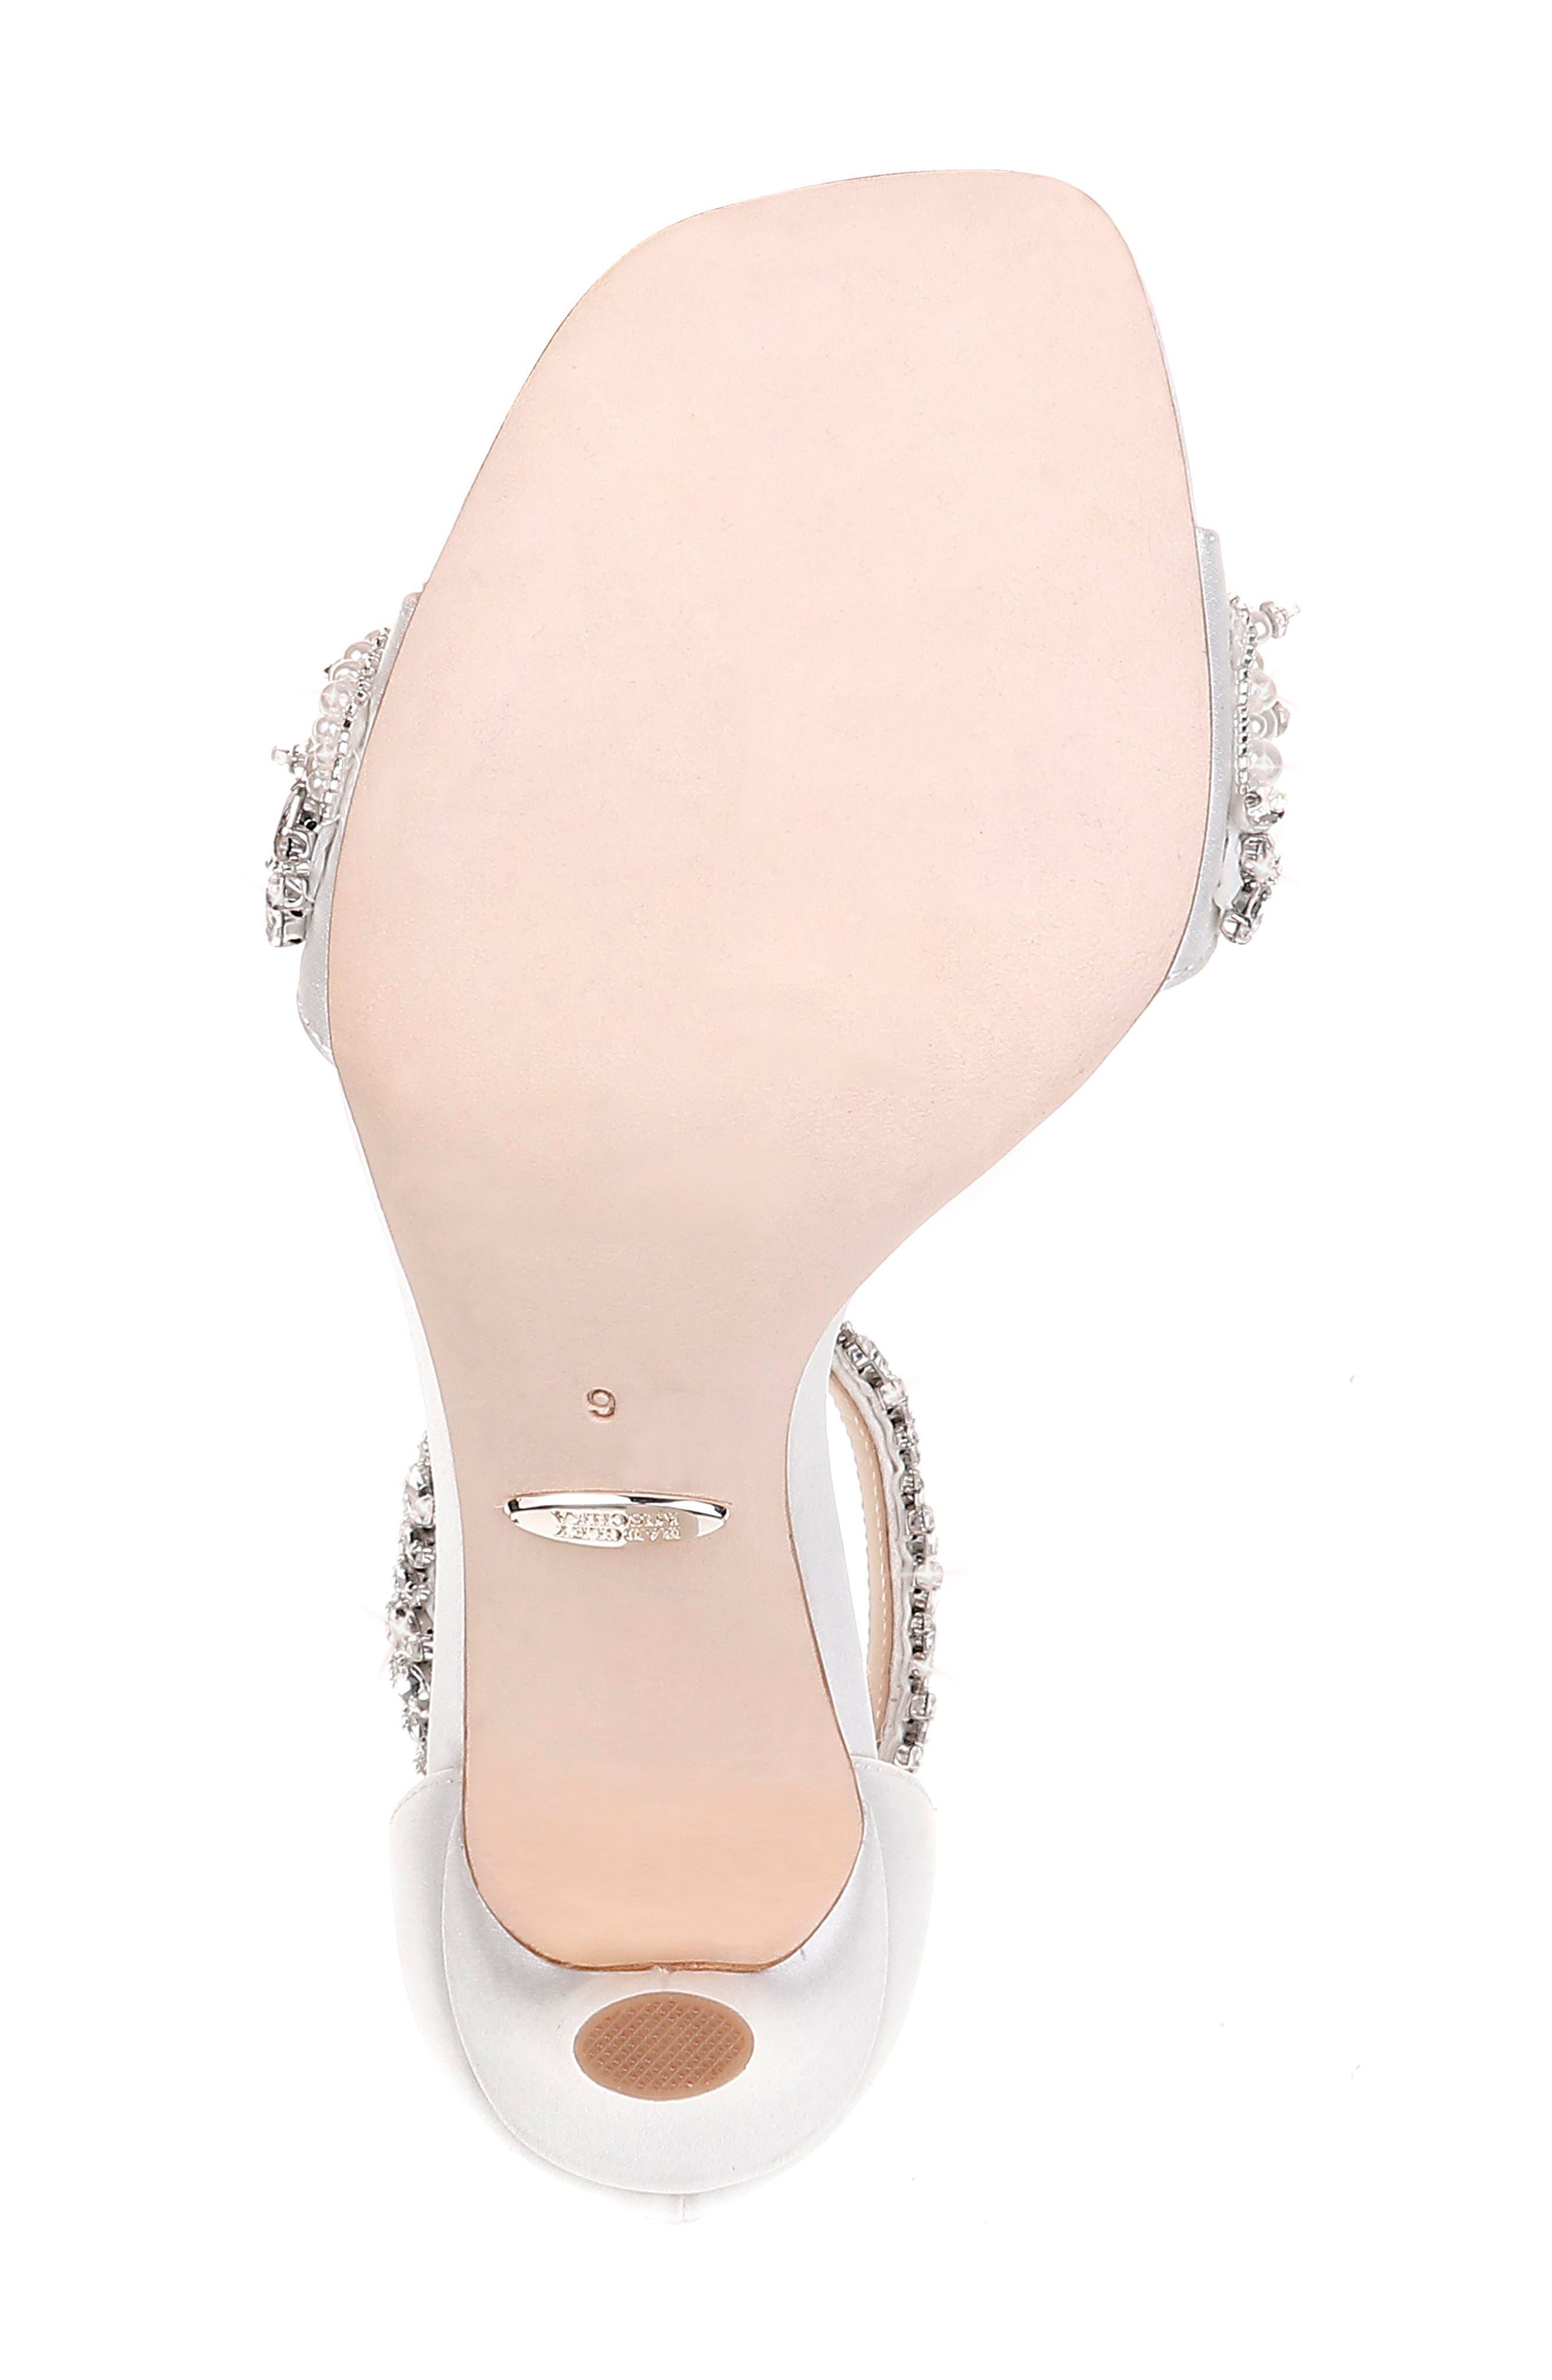 BADGLEY MISCHKA COLLECTION, Badgley Mischka Fiorenza Crystal & Imitation Pearl Embellished Sandal, Alternate thumbnail 6, color, SOFT WHITE SATIN